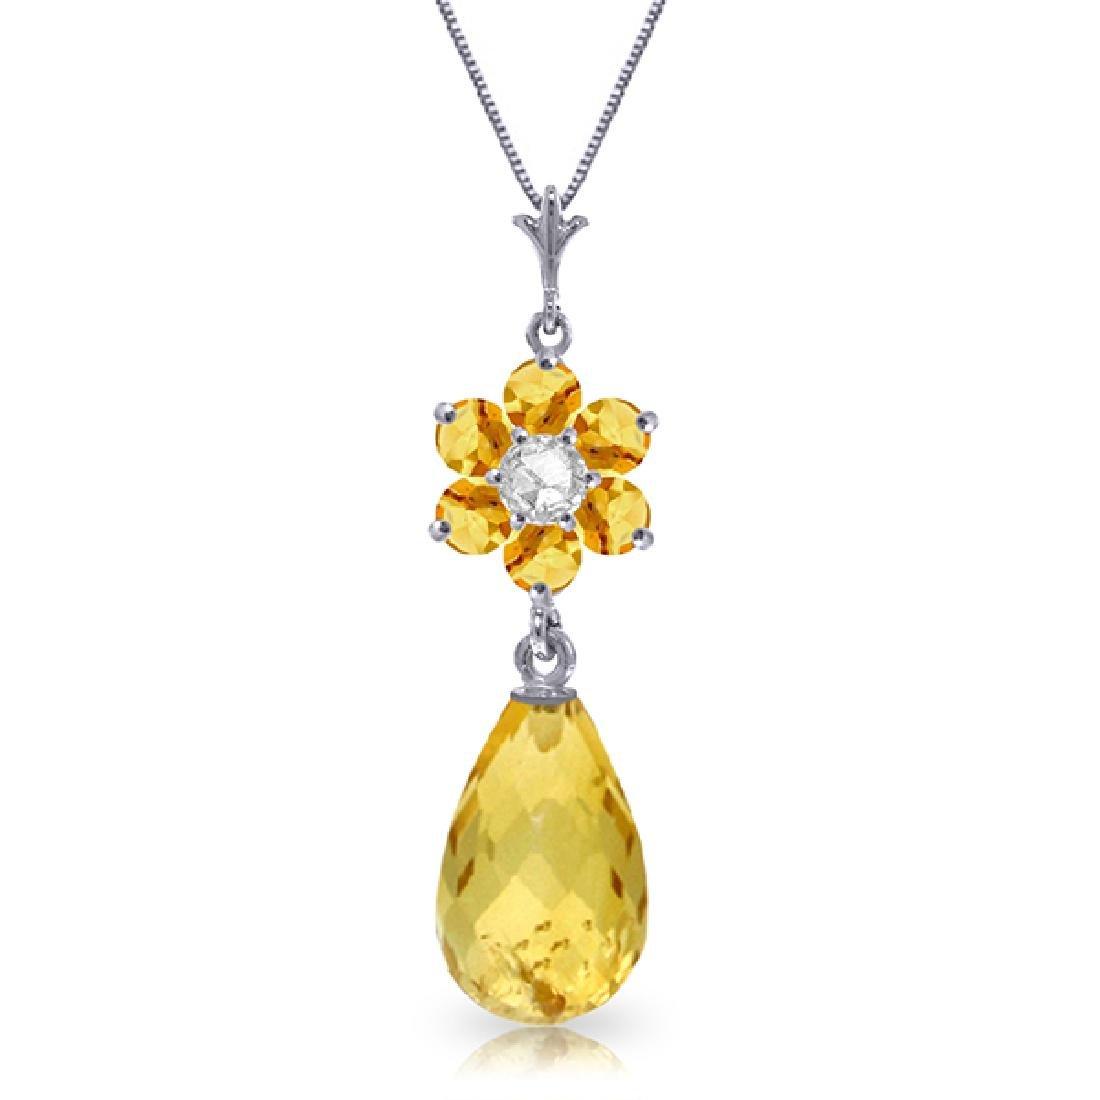 Genuine 2.78 ctw Citrine & Diamond Necklace Jewelry